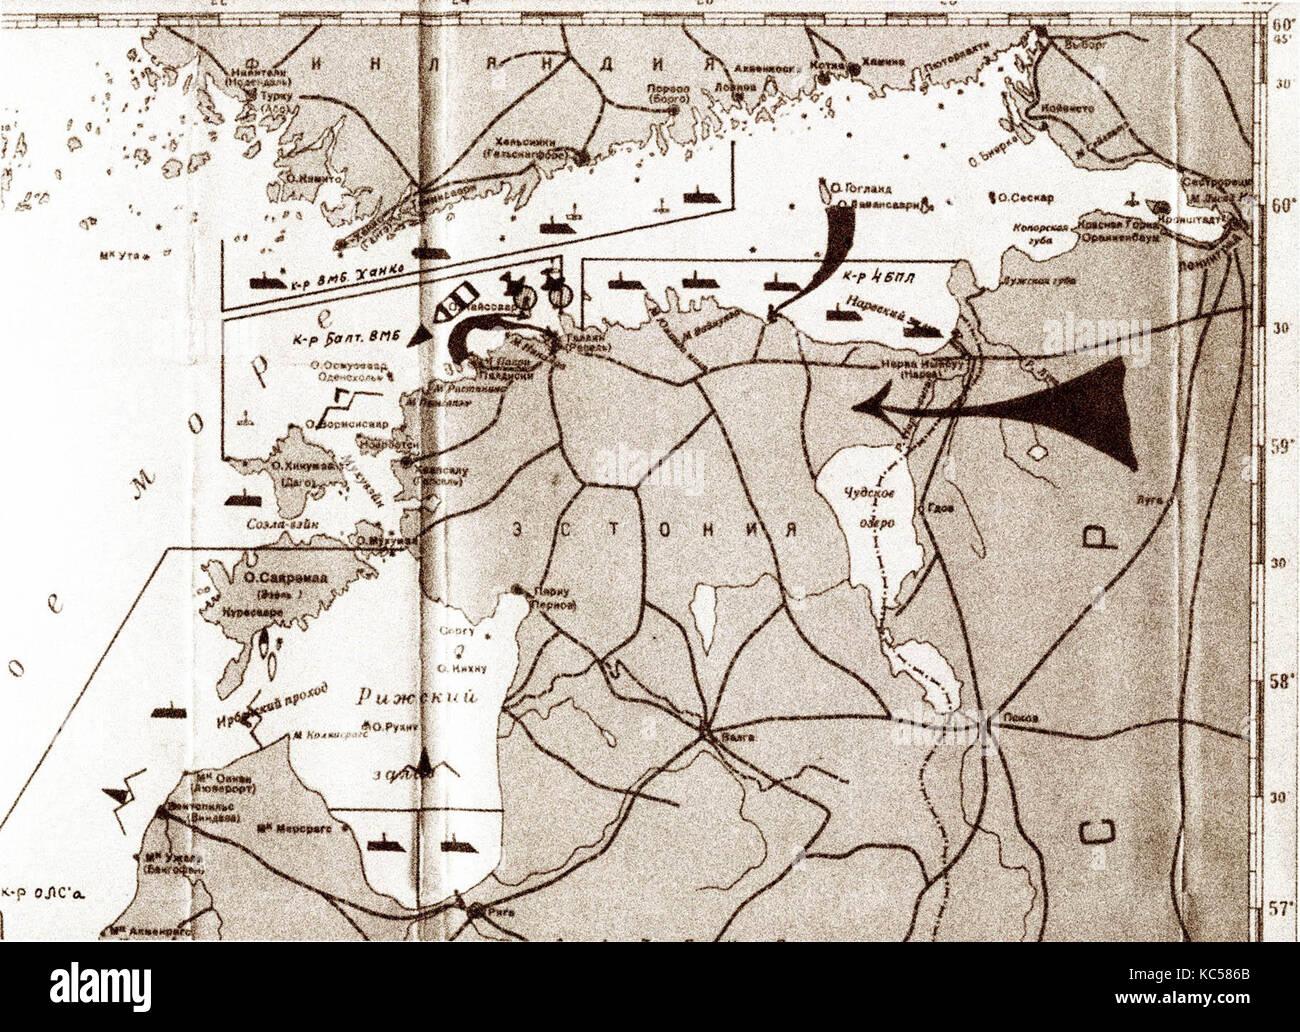 Schematics of the Soviet military blockade and invasion of Estonia and Latvia in 1940 - Stock Image